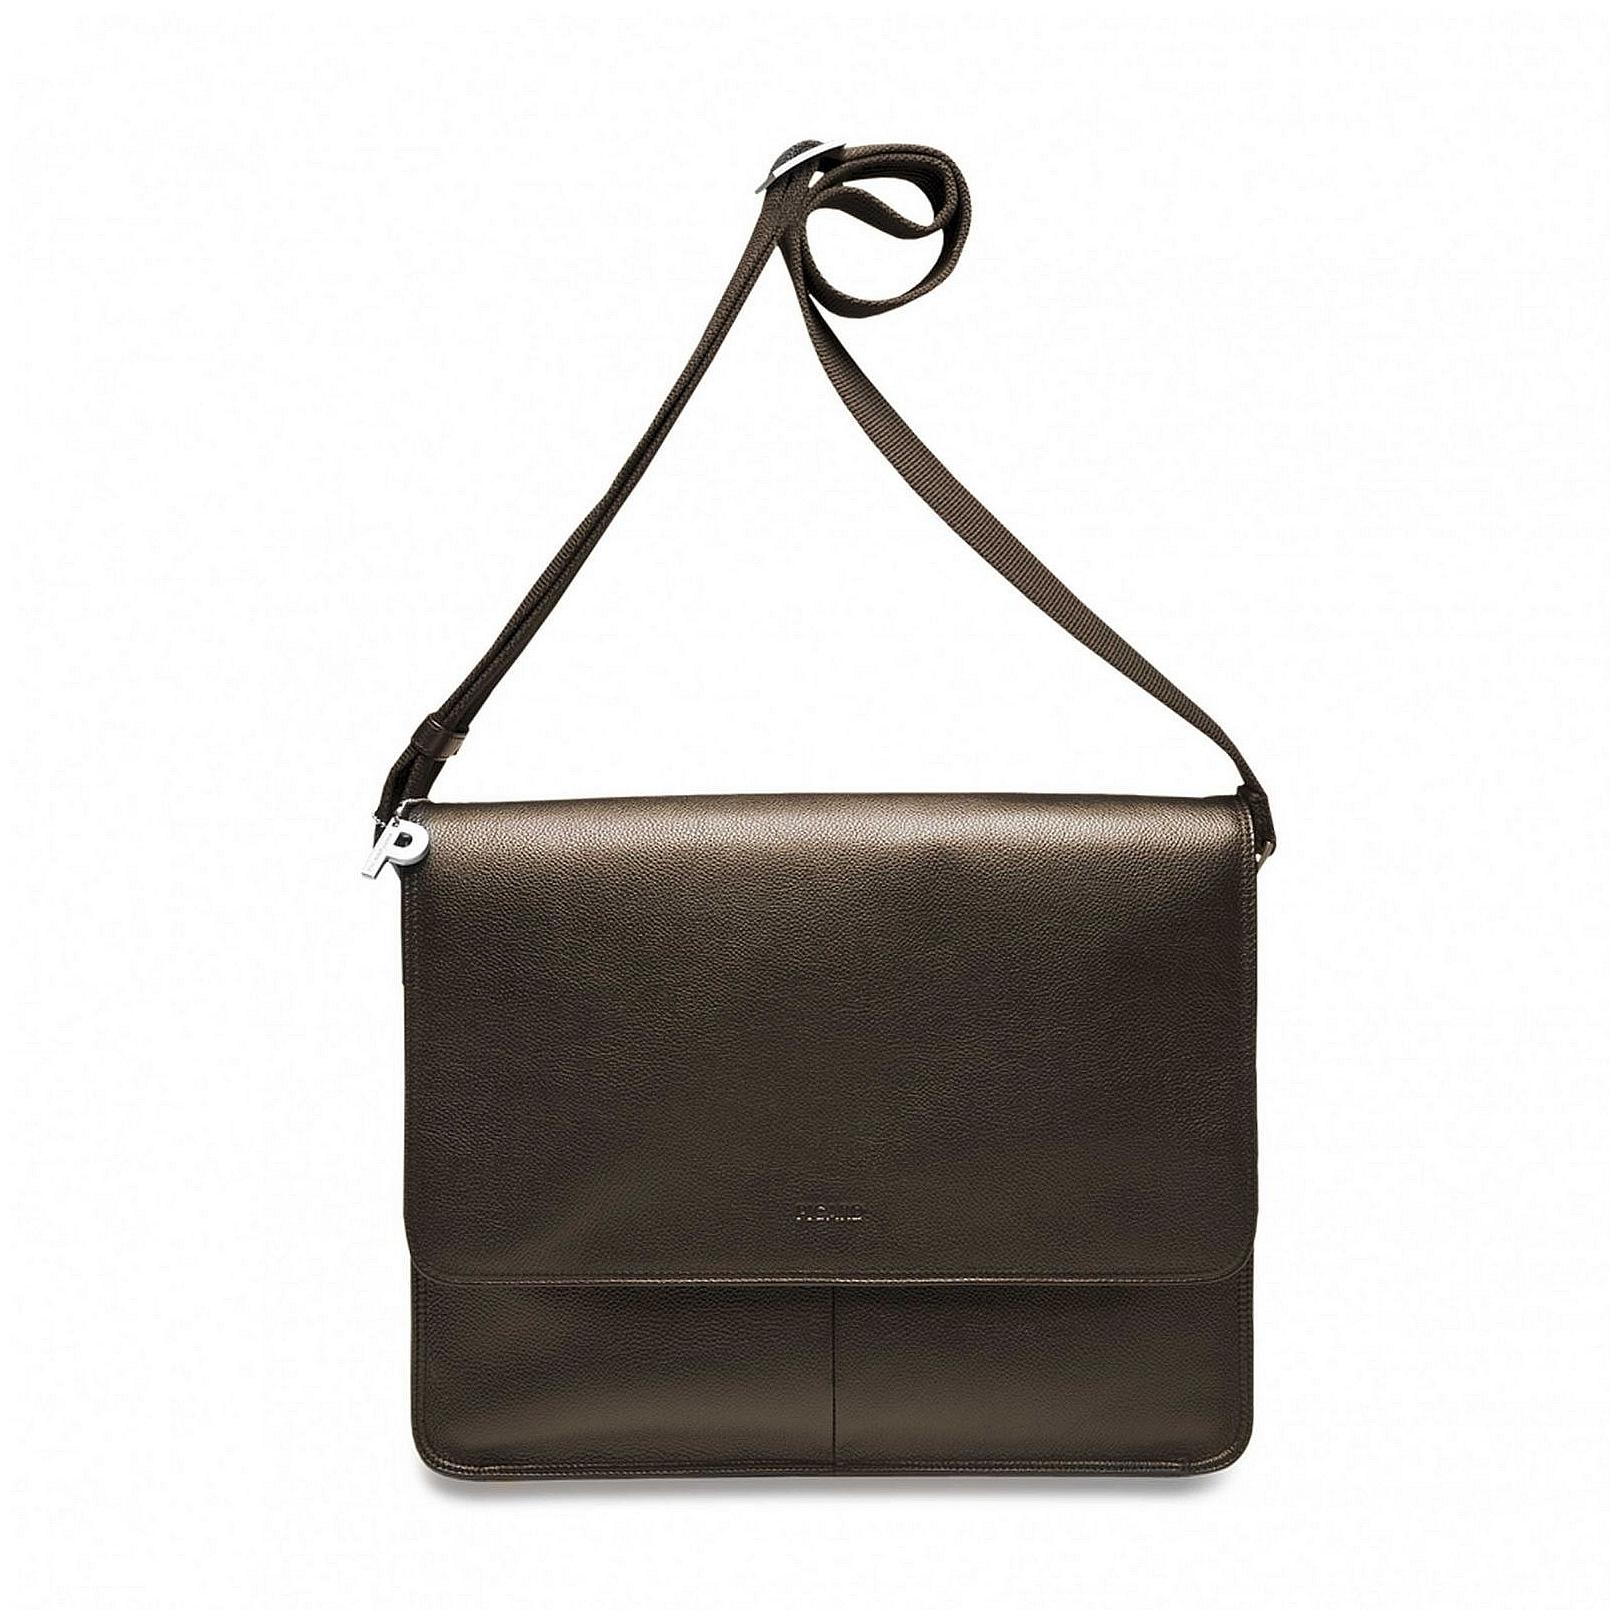 PICARD Kožená taška přes rameno MILANO 6942 tmavě hnědá 137086b2d7